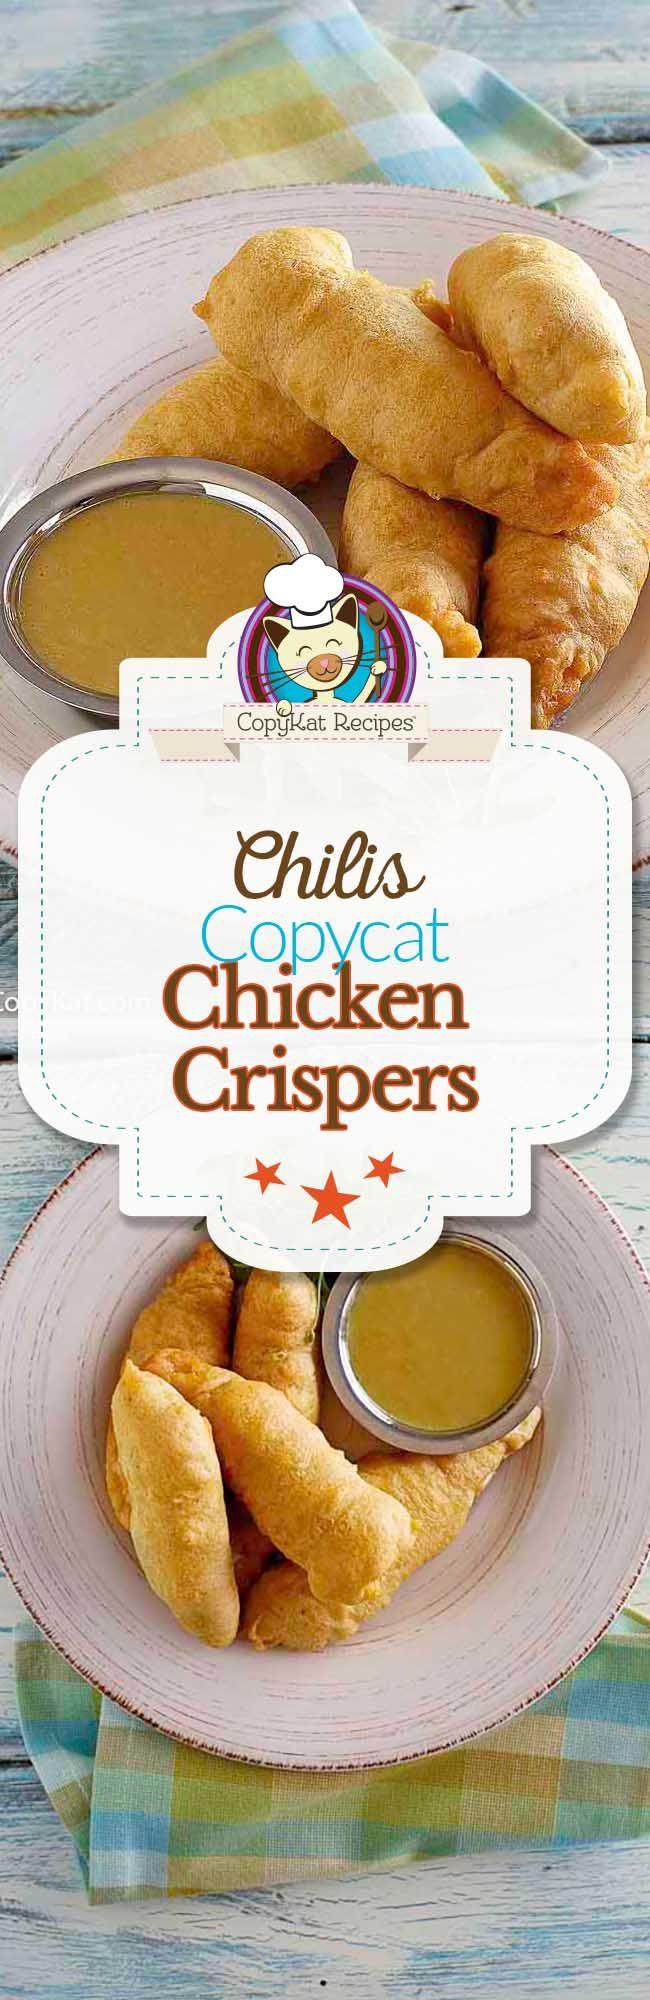 Chilis Chicken Crispers Original Recipe Chicken